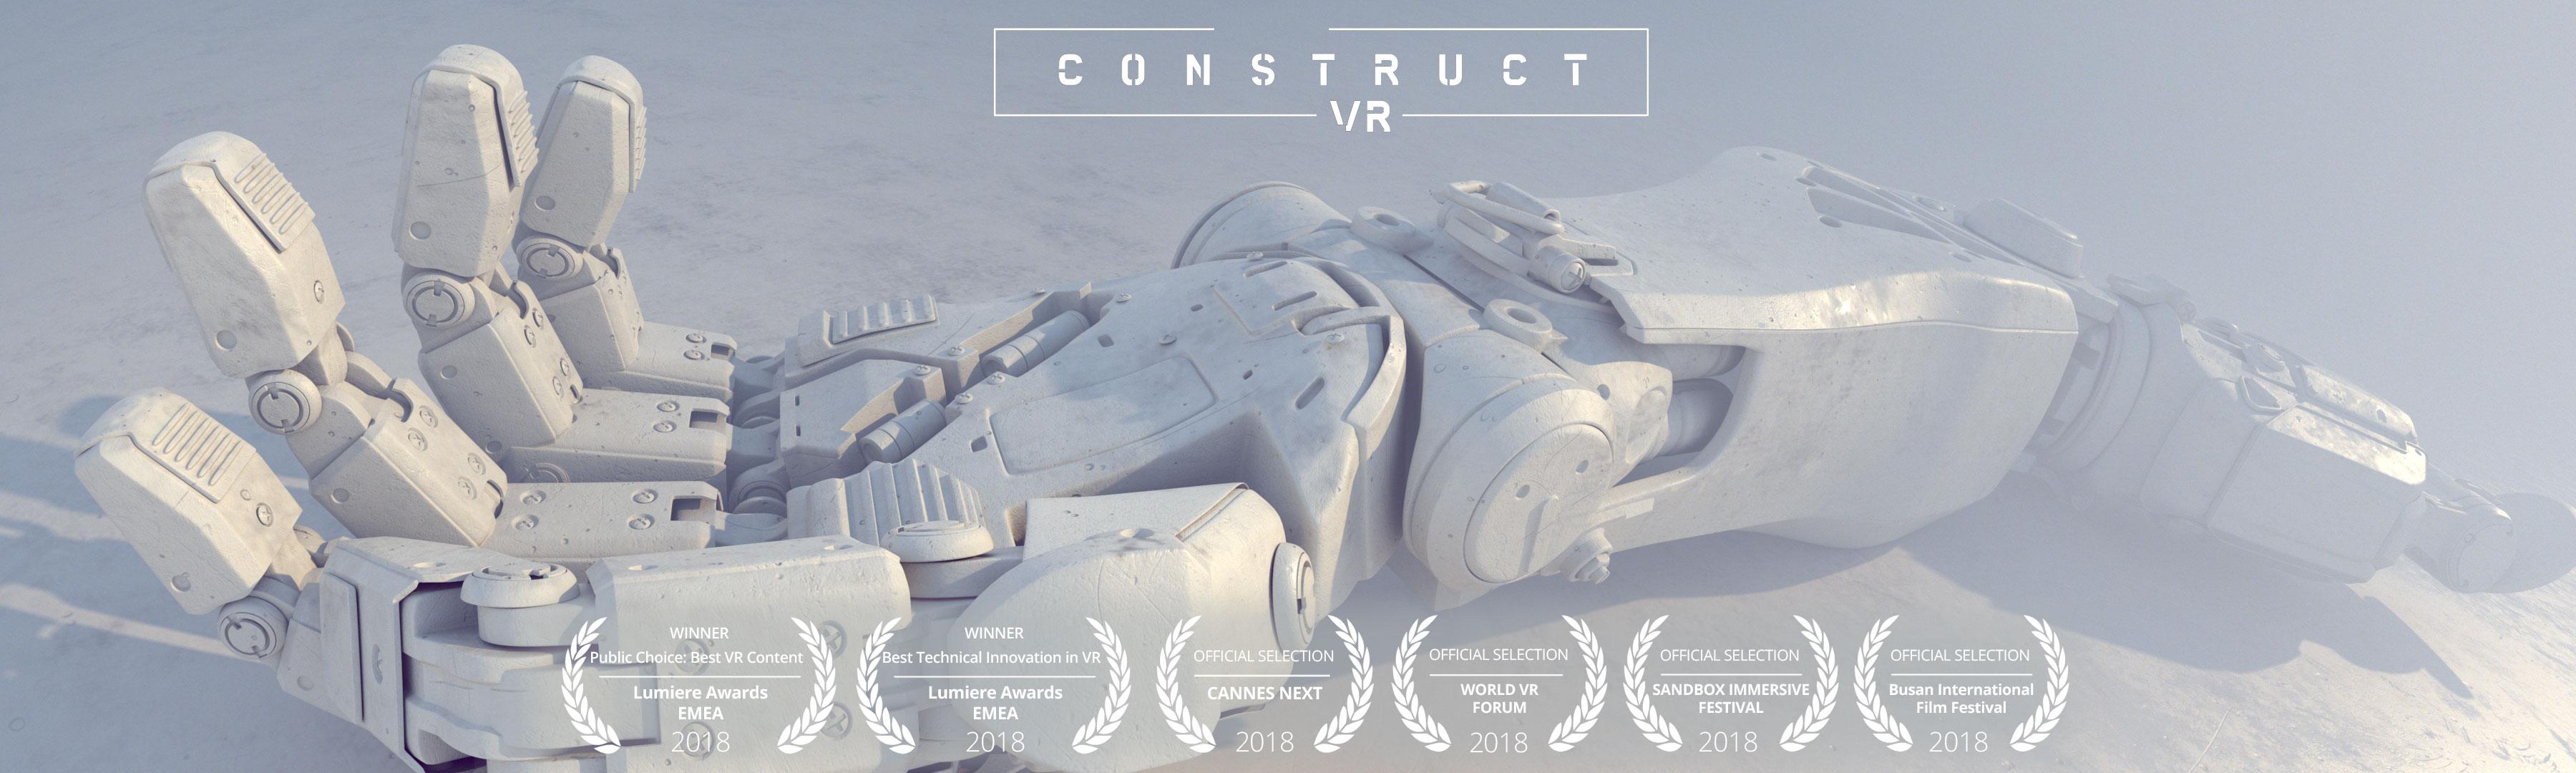 Winner lumiere awards construct